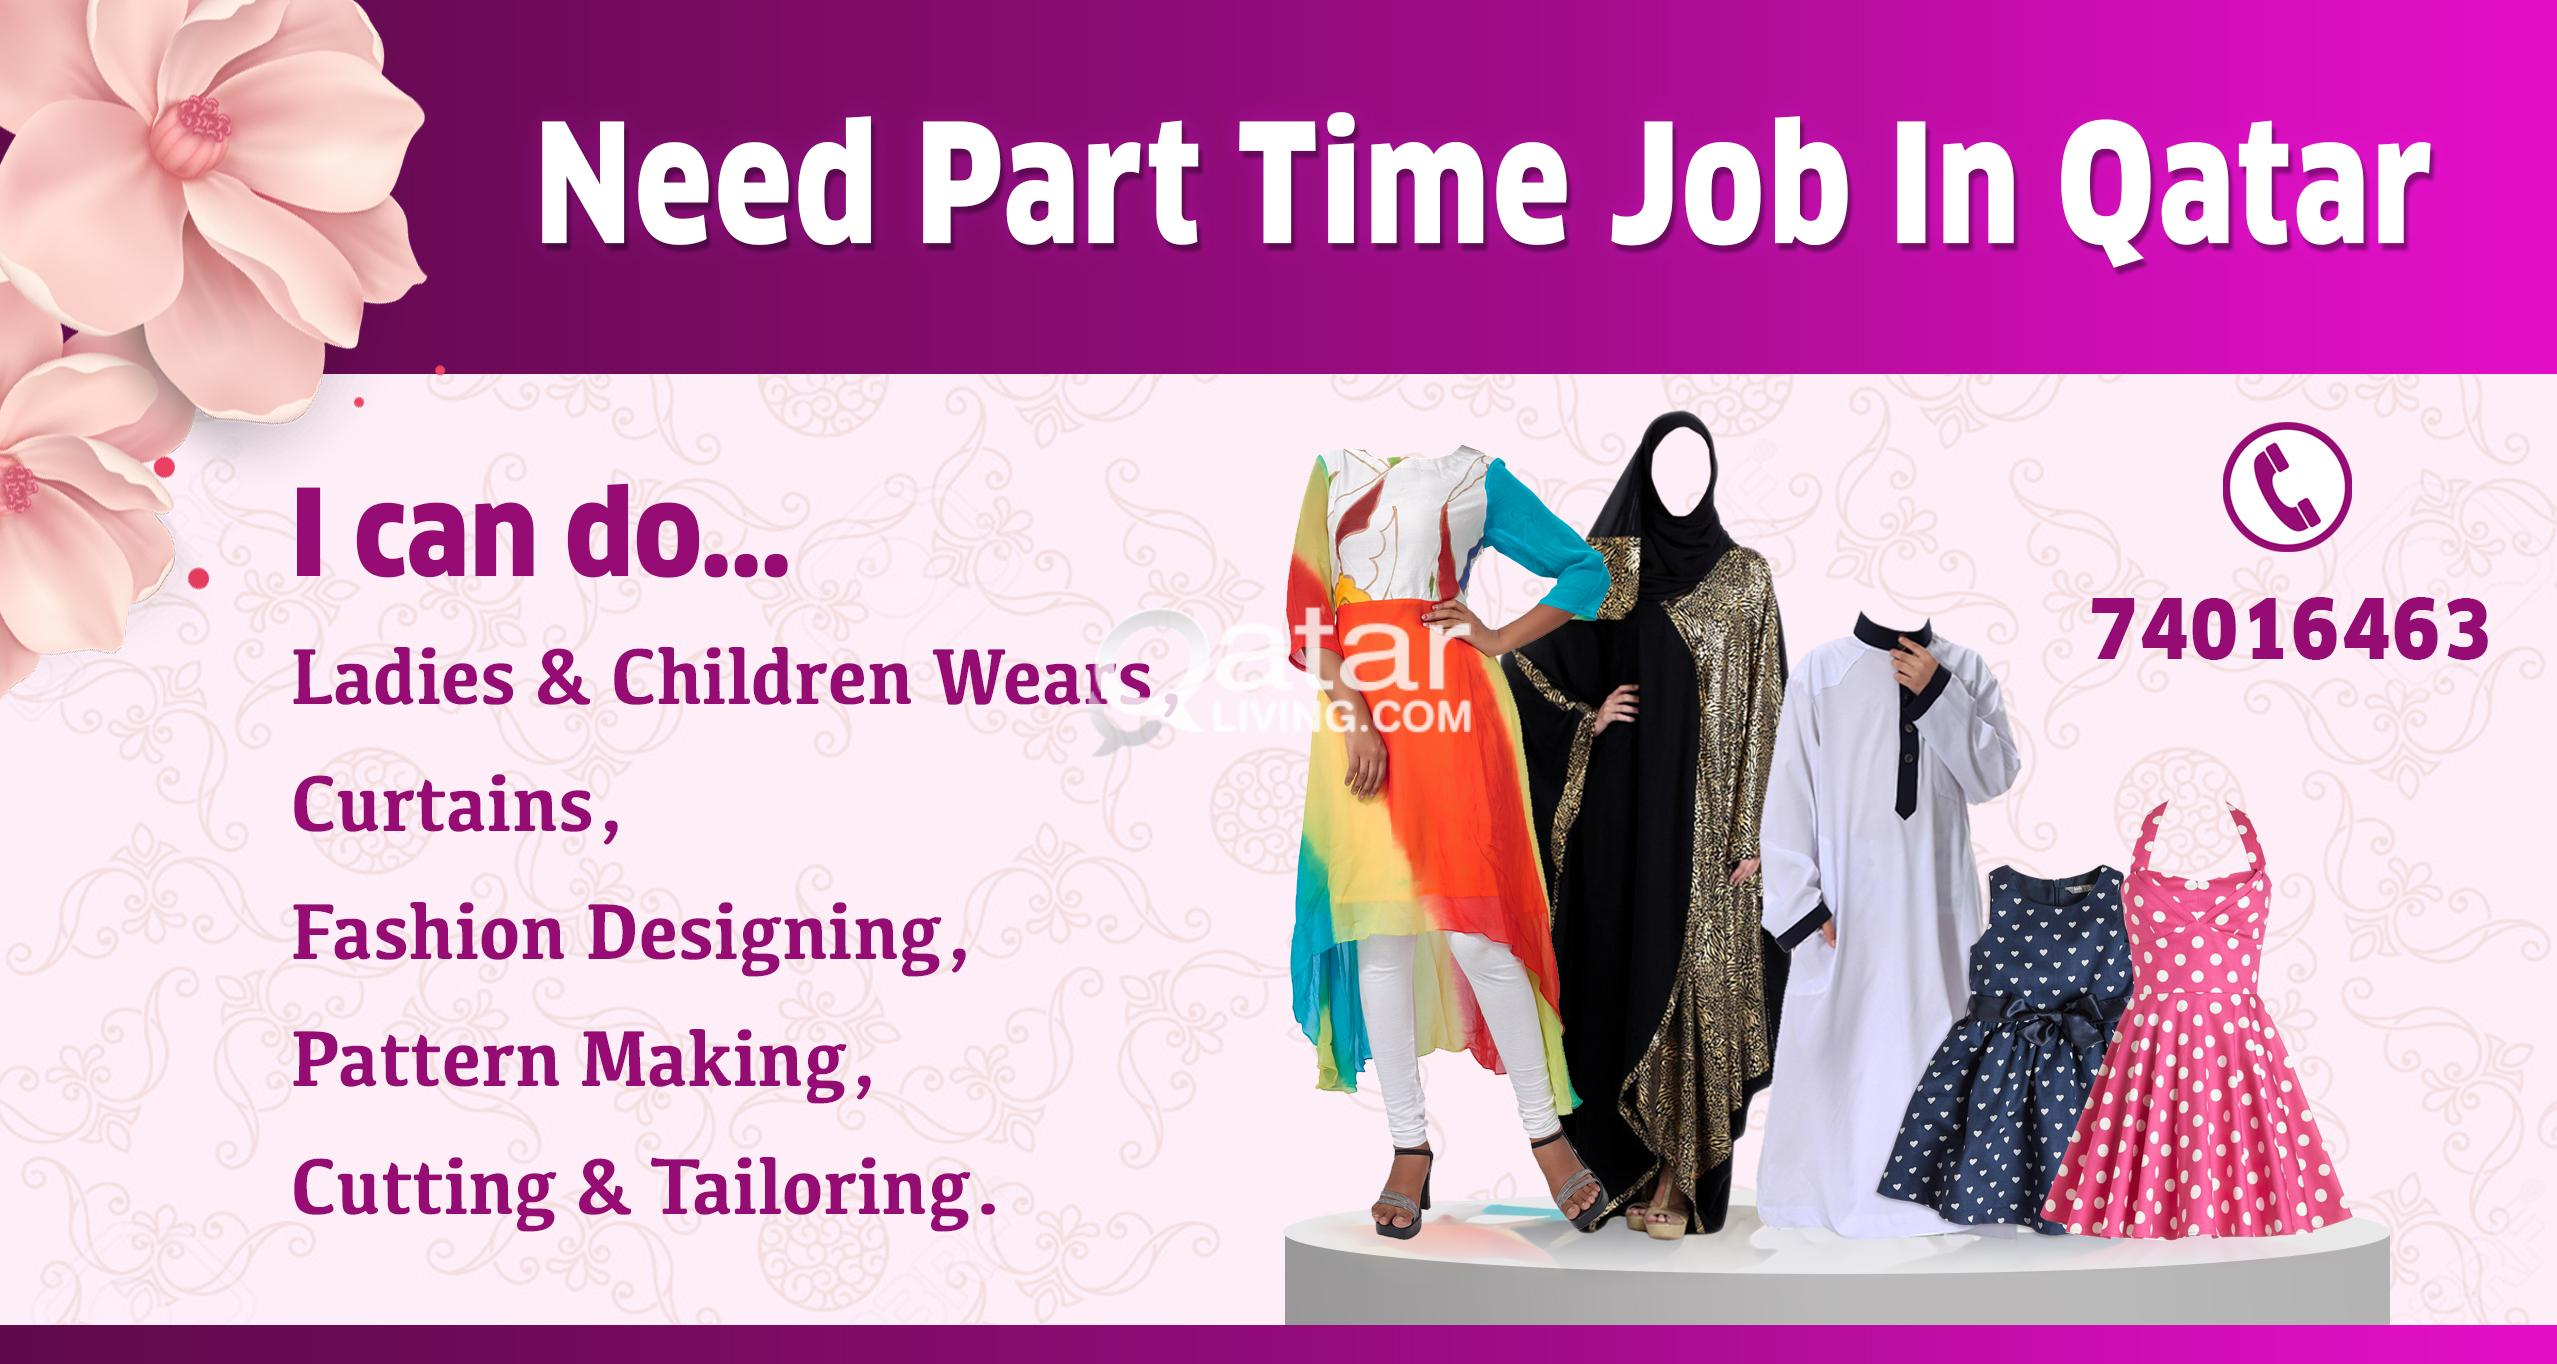 Dress Maker Tailor Part Time Job Wanted Qatar Living